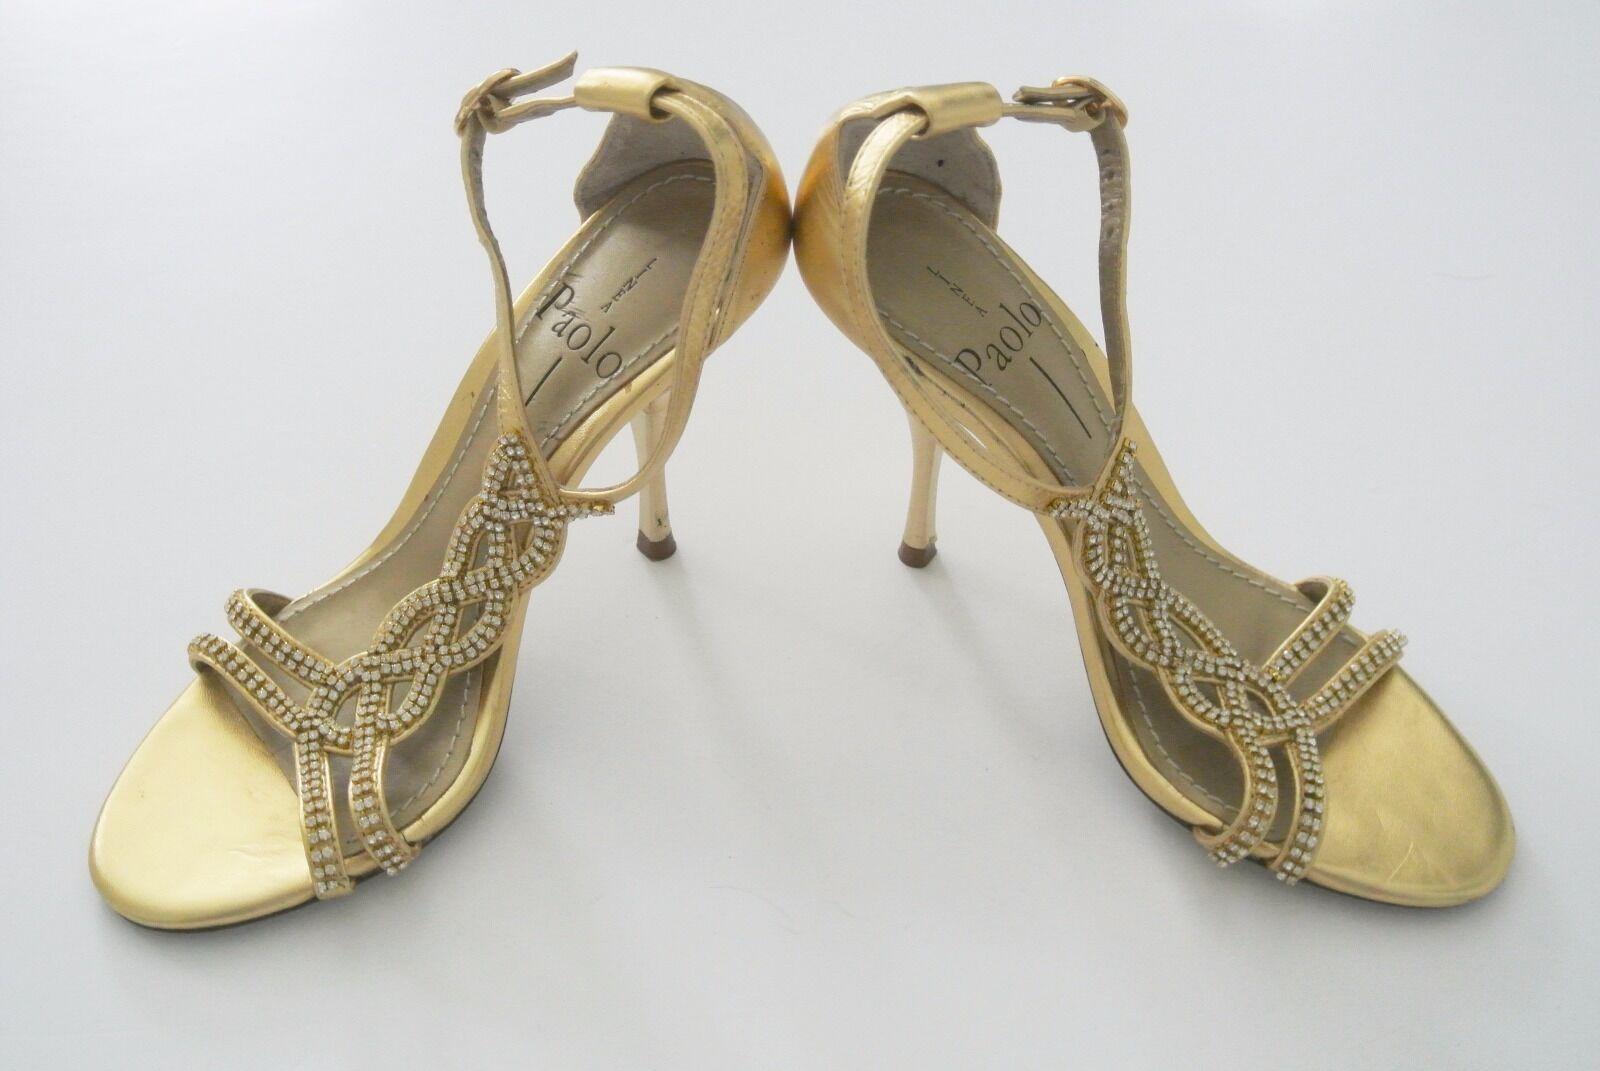 oro C   Cristal Adornos Linea Paolo Tiras 4-in Tacones Sandalias, m